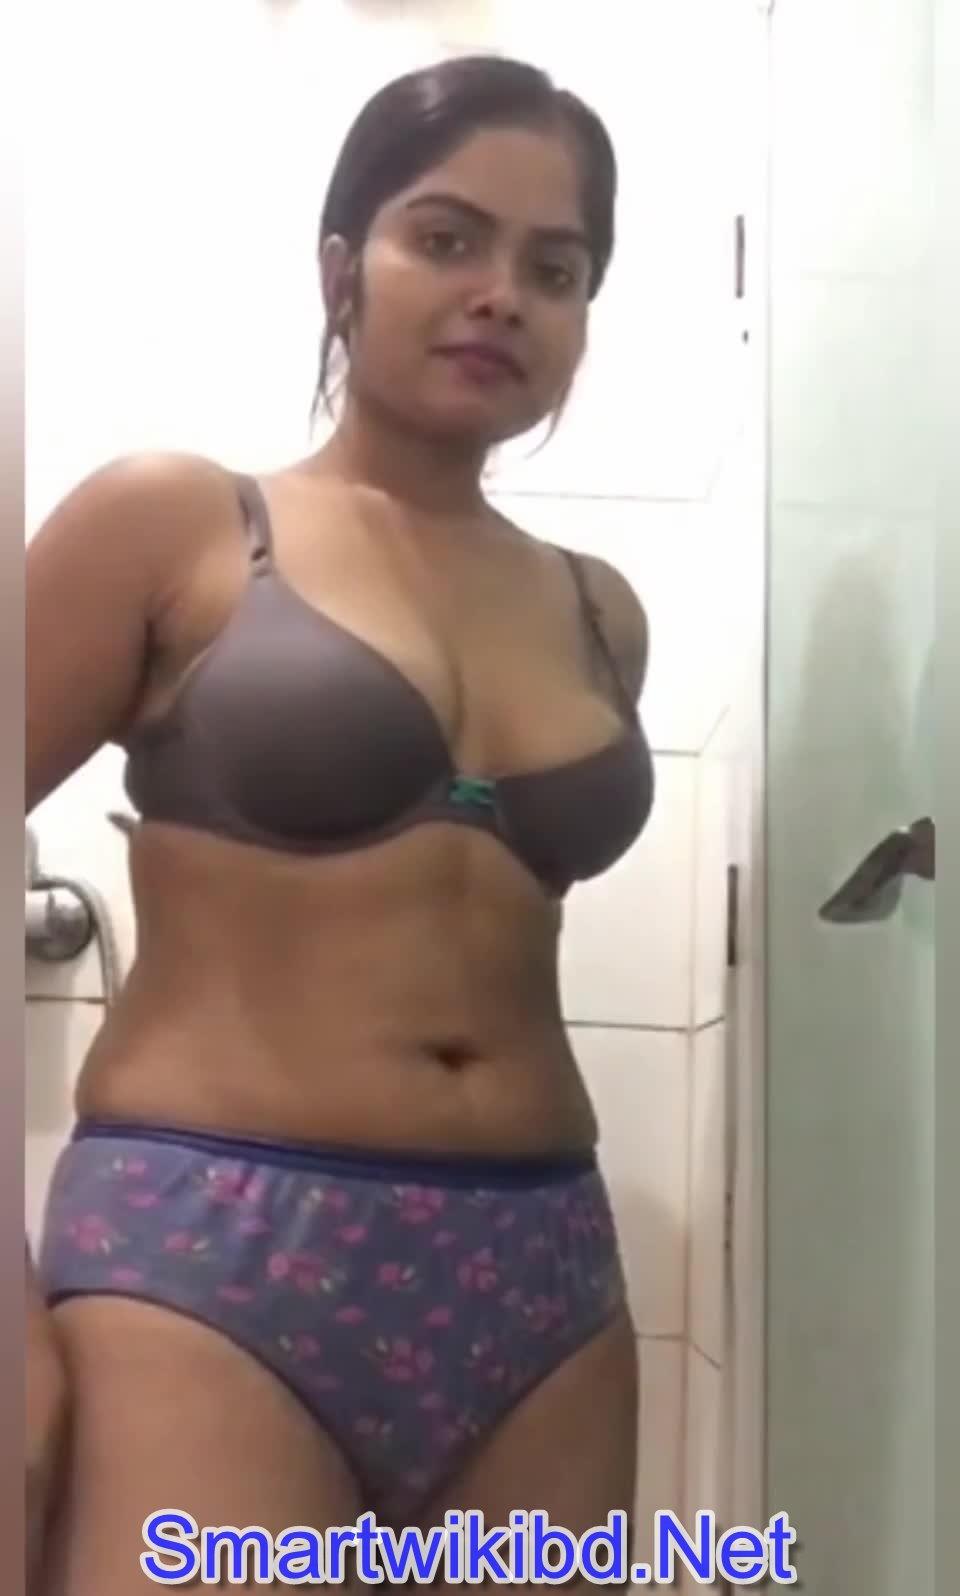 BD Chuadanga District Area Call Sex Girls Hot Photos Mobile Imo Whatsapp Number